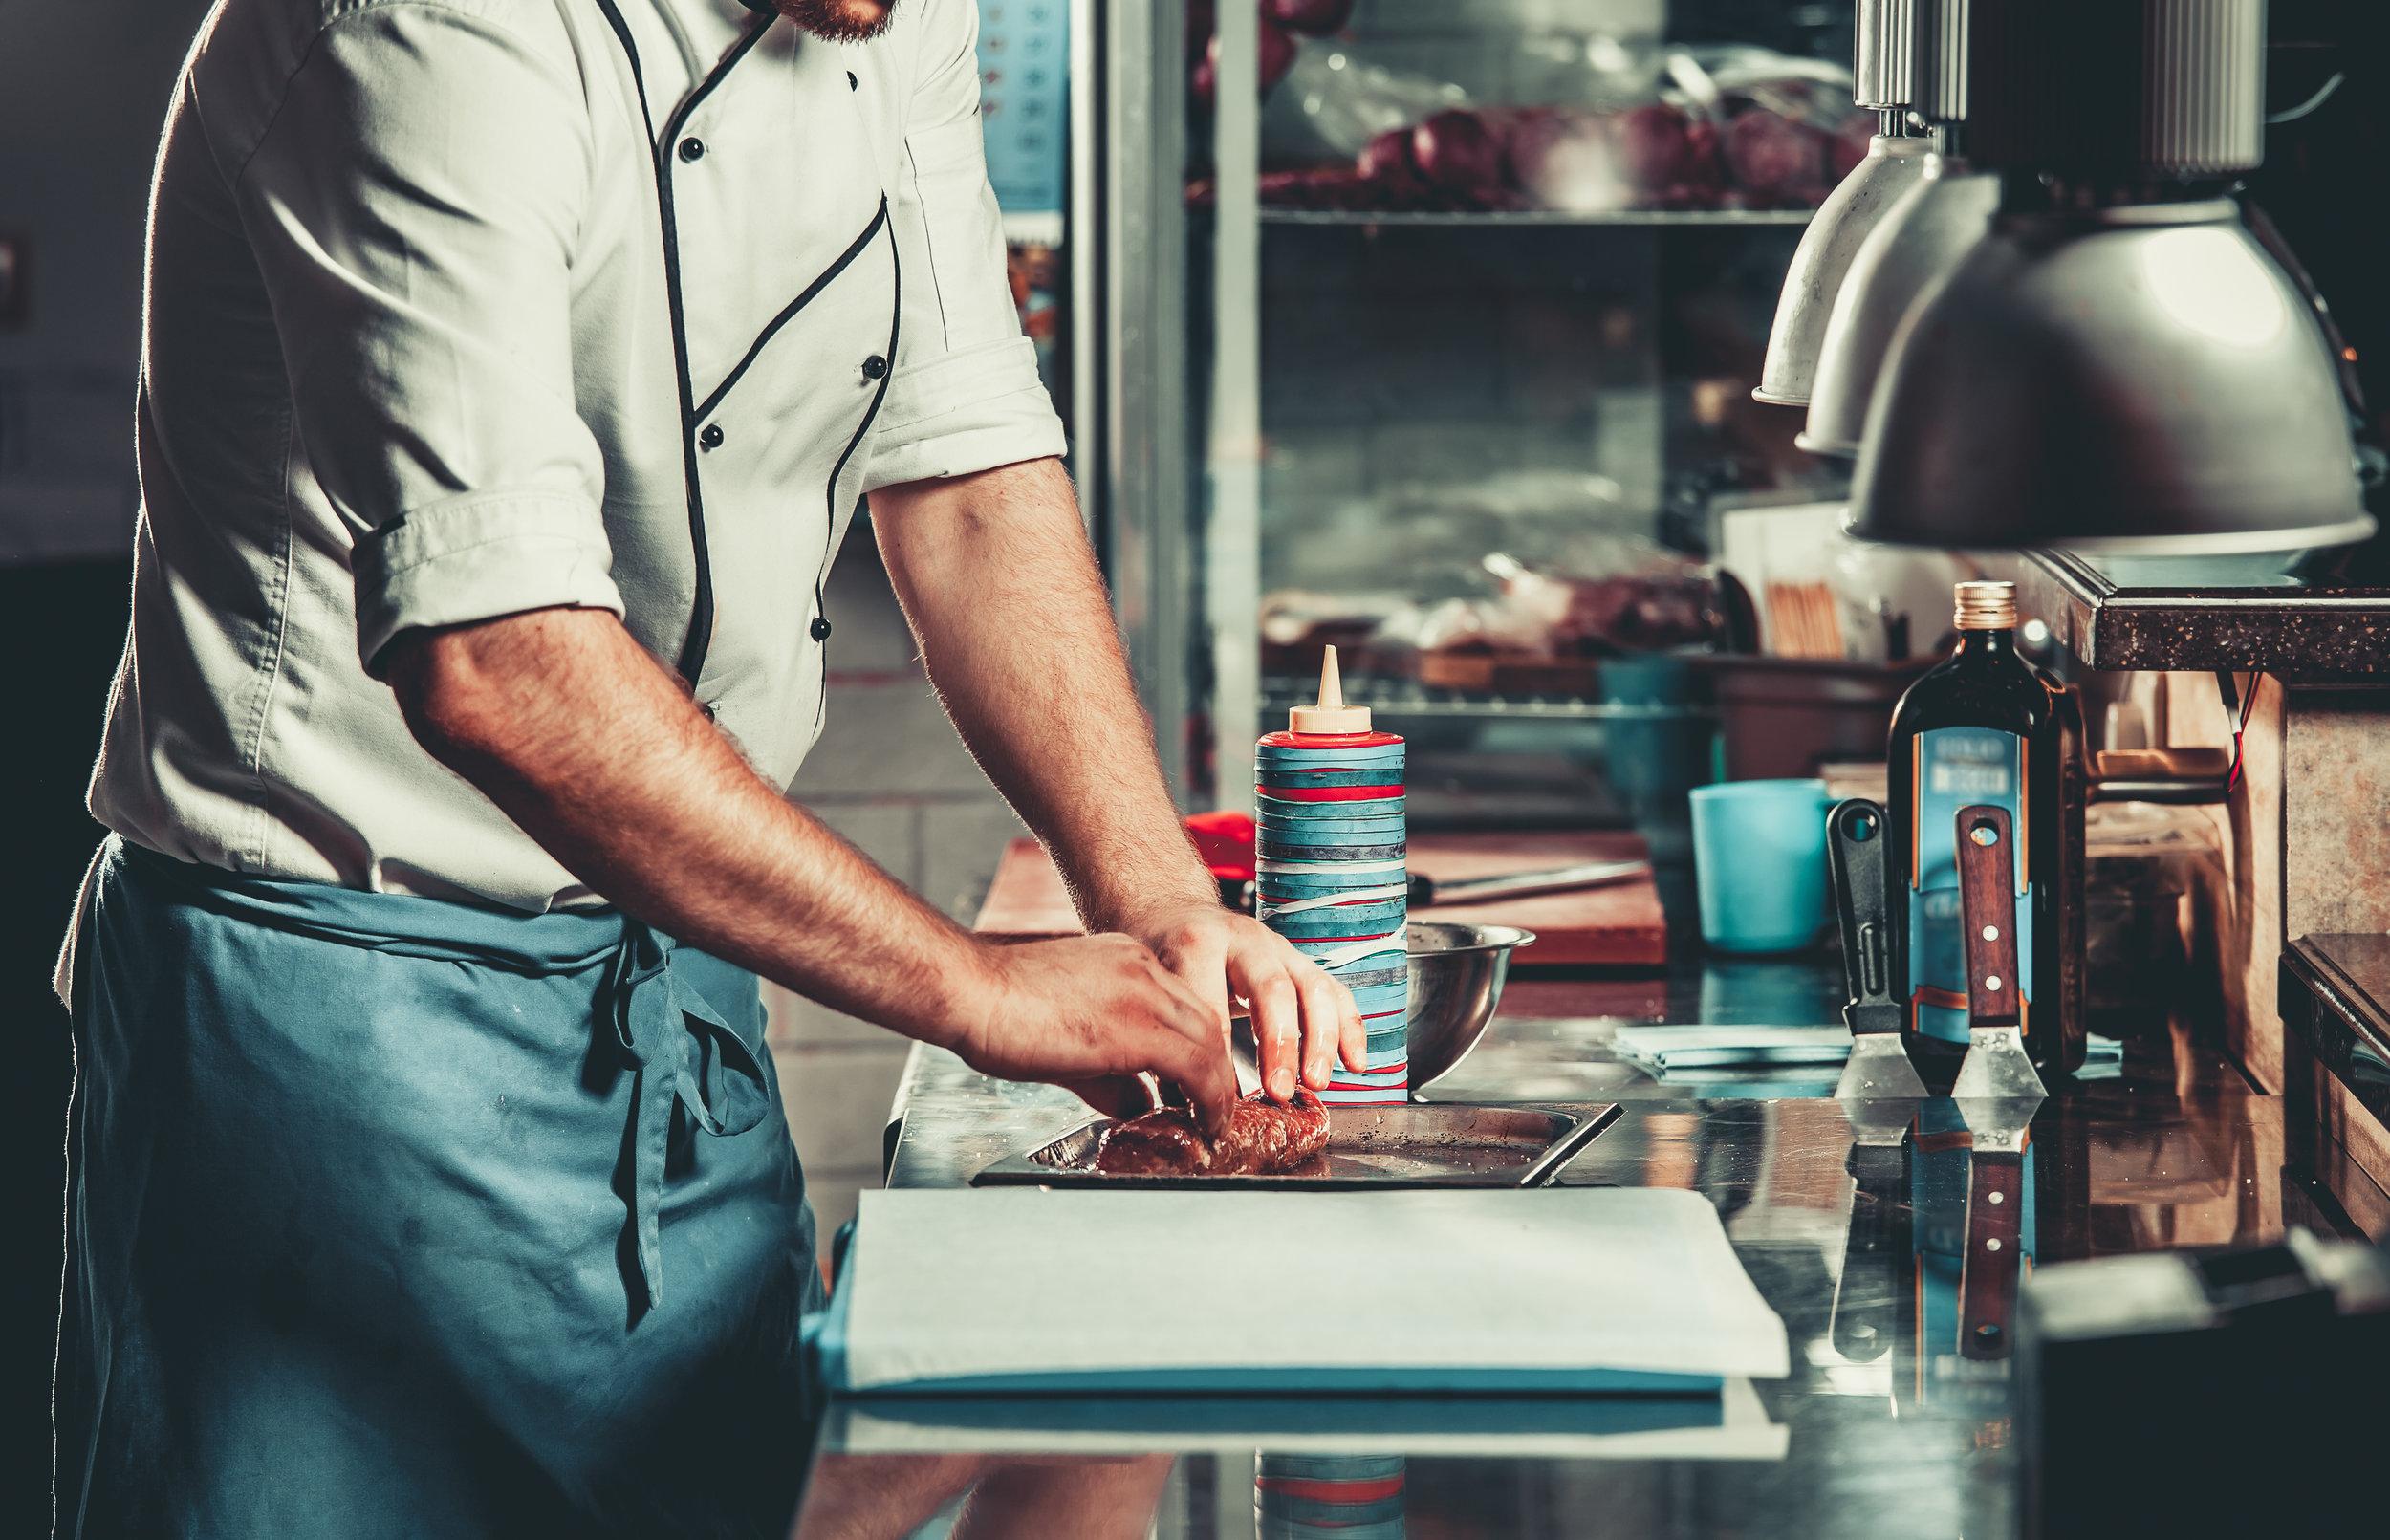 man plating food in kitchen.jpg